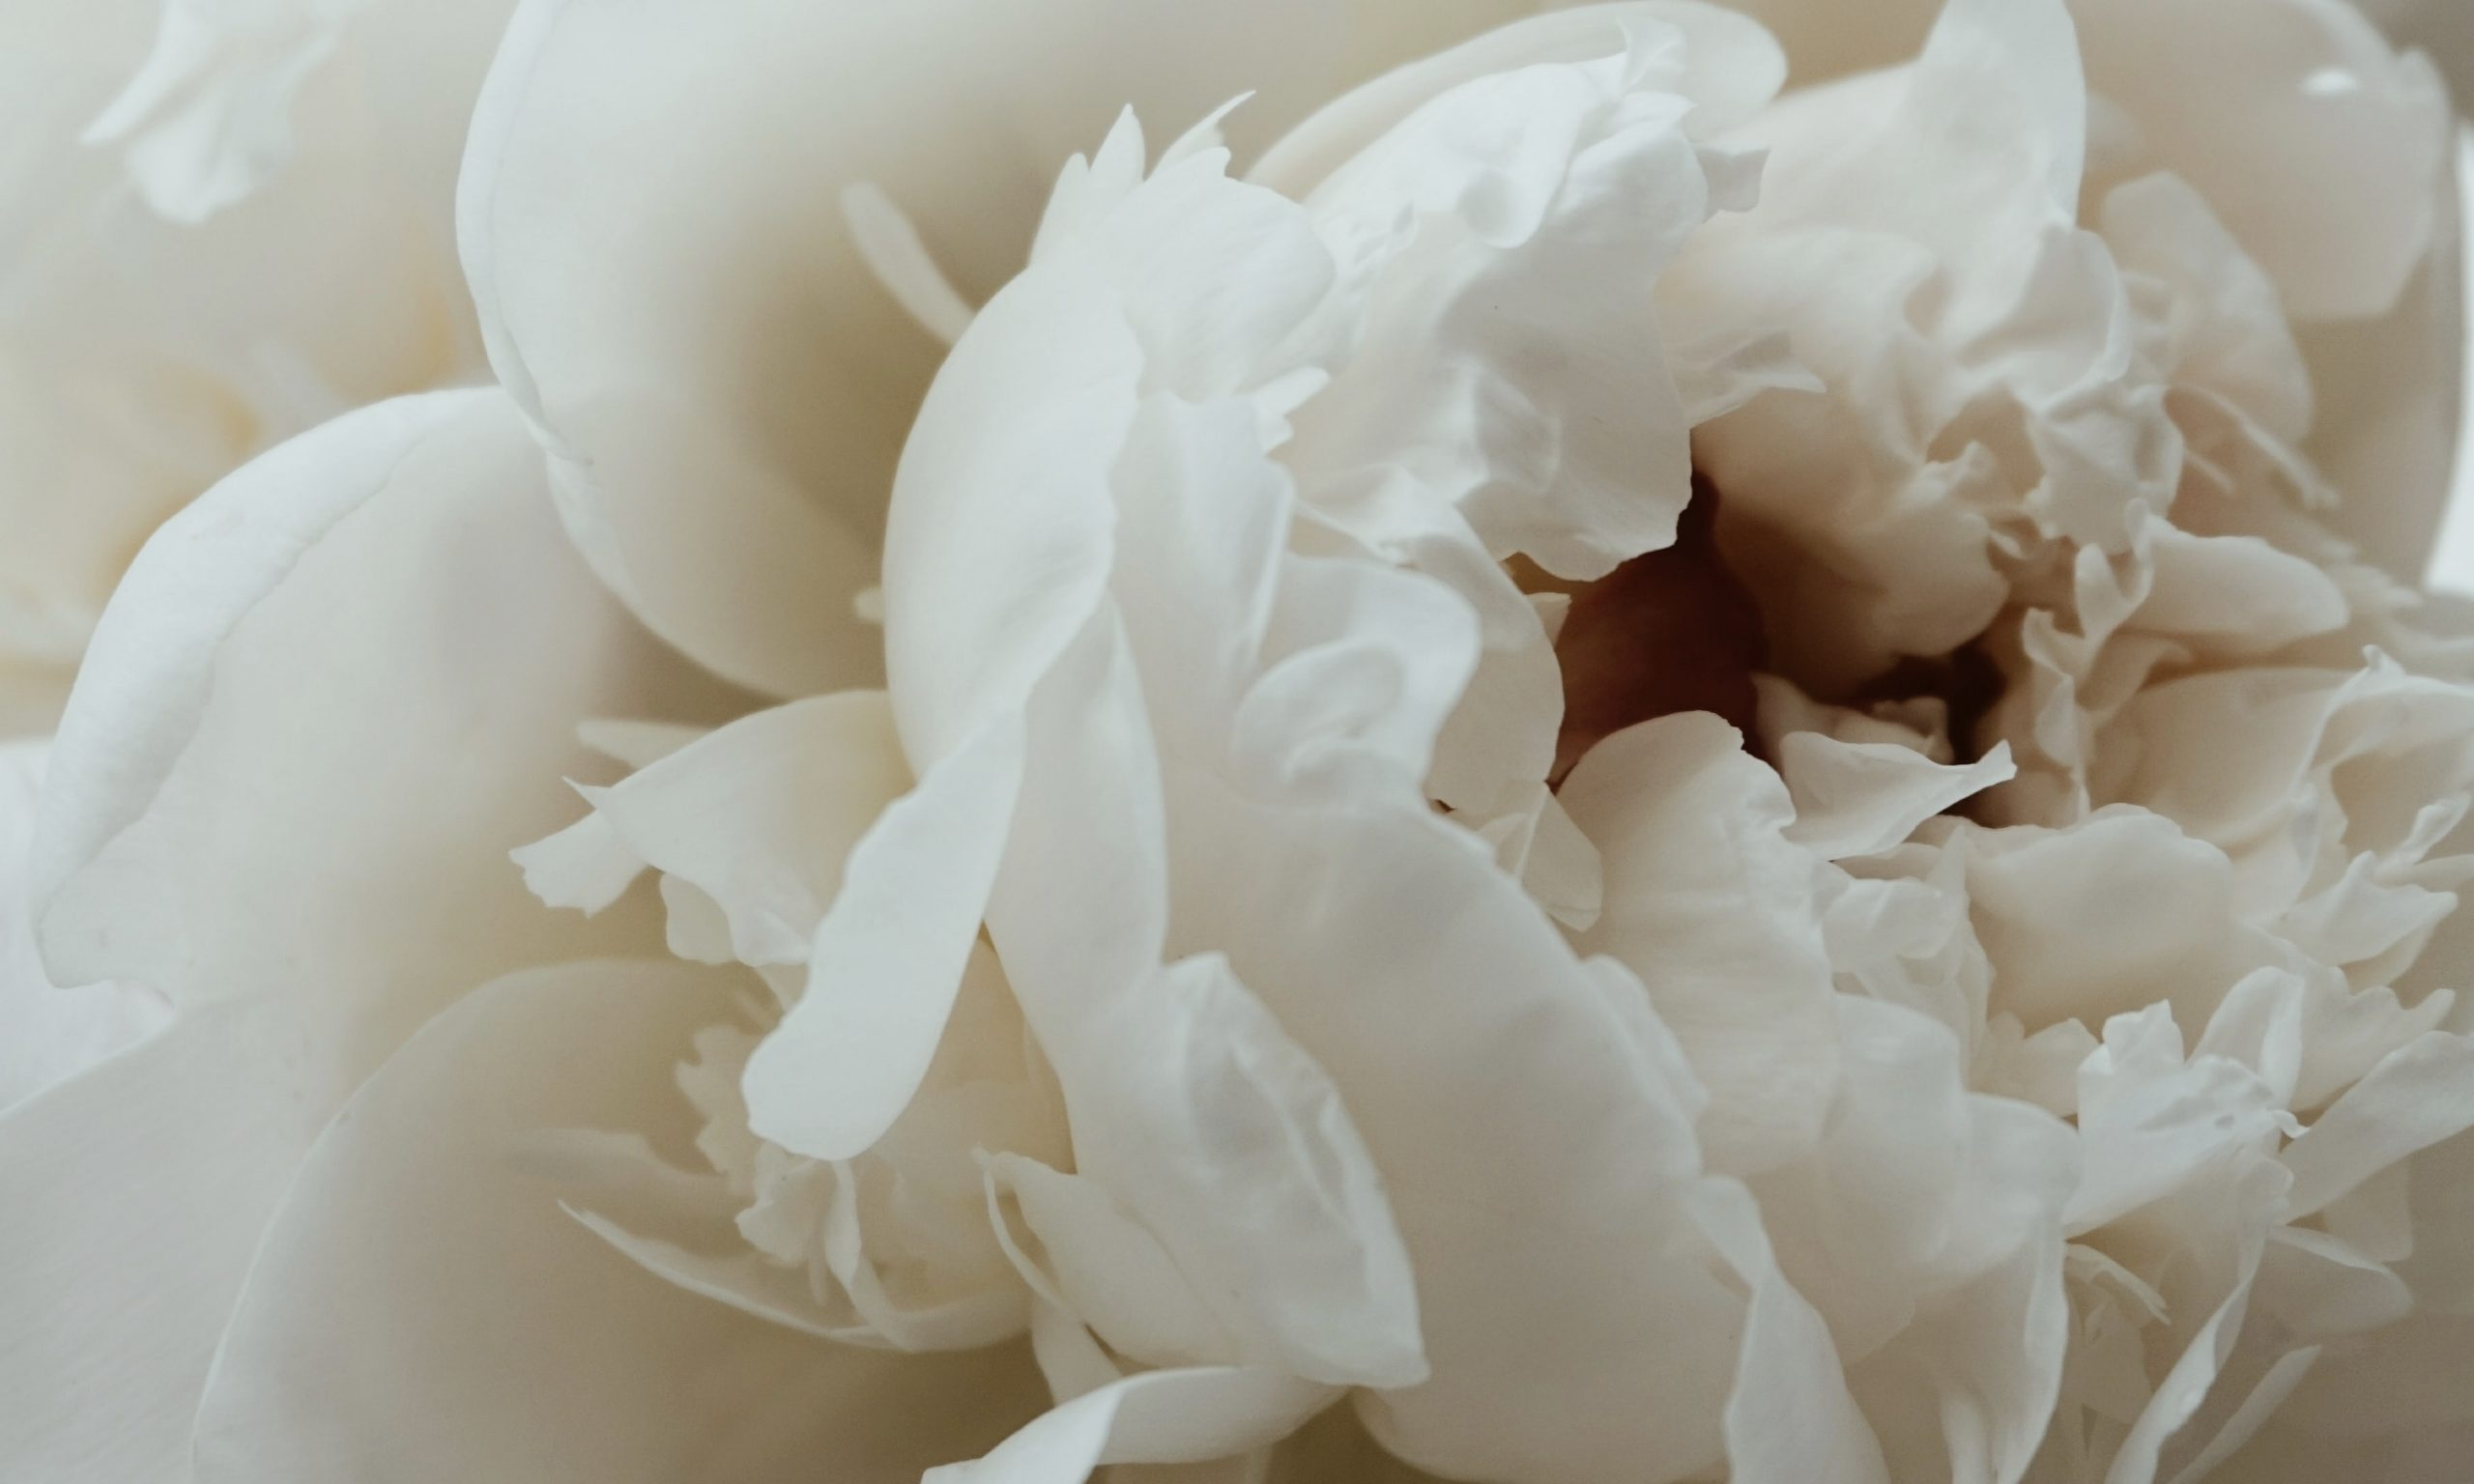 natural anti inflammatory - Paeonia lactiflora - White Peony extract - Linden Botanicals